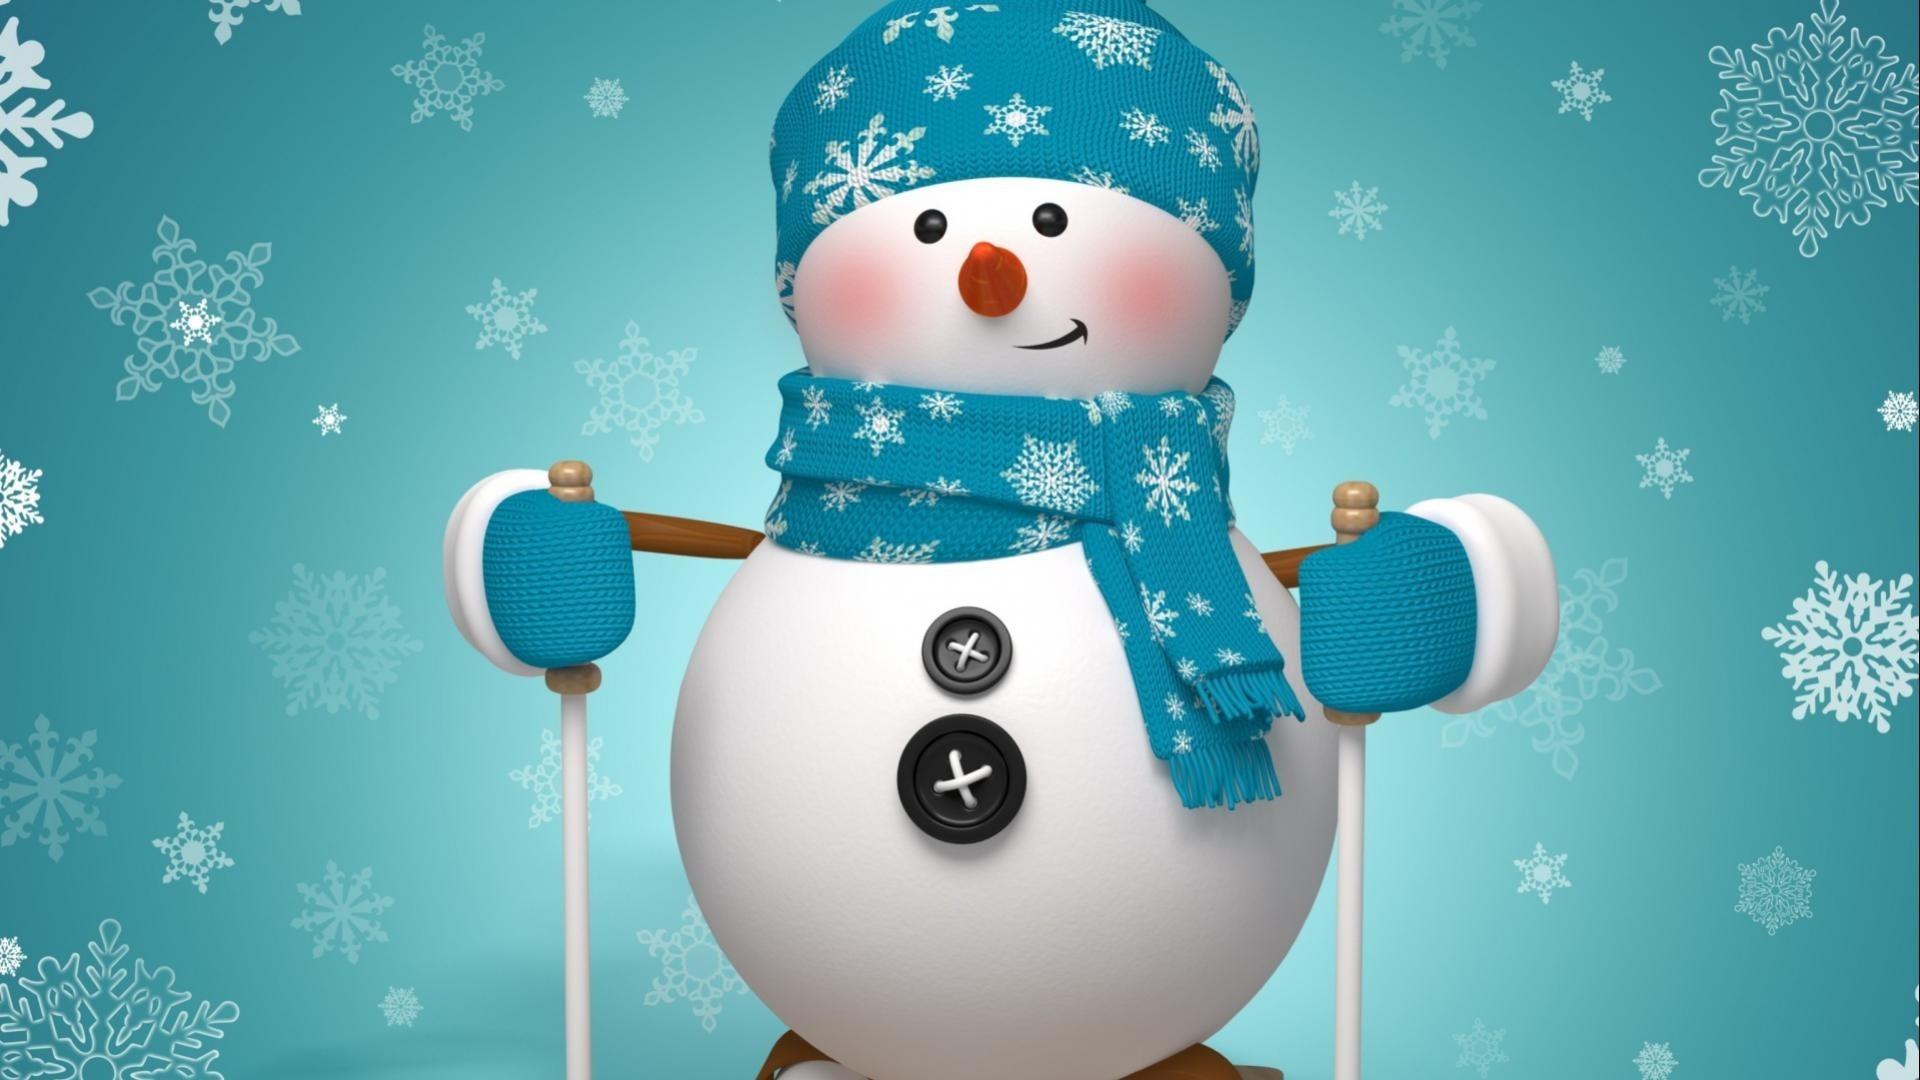 Snowman Image